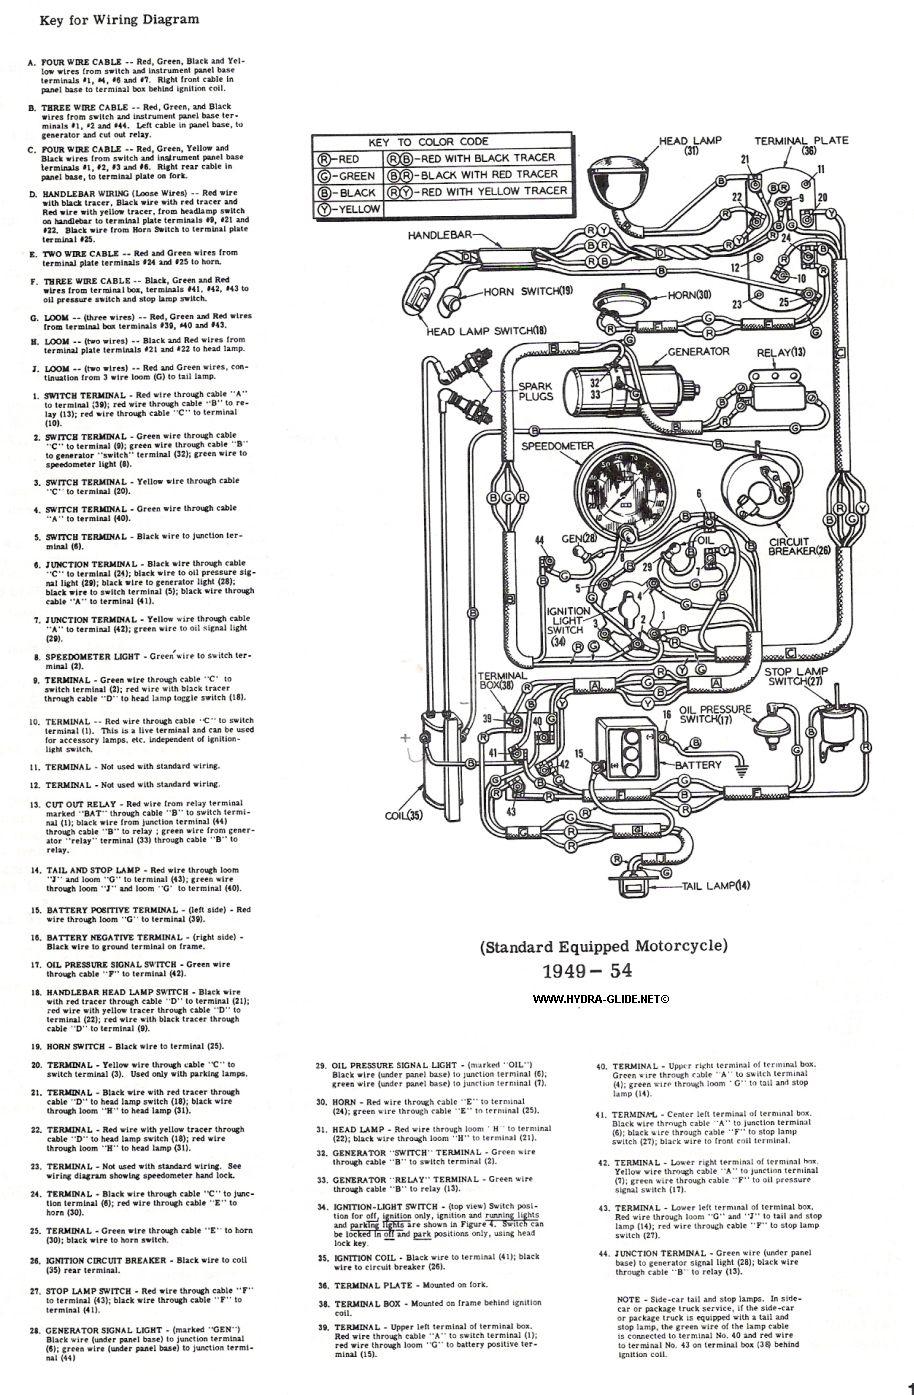 12 Volt Ignition Coil Wiring Diagram   Wiring Diagram - 12 Volt Ignition Coil Wiring Diagram